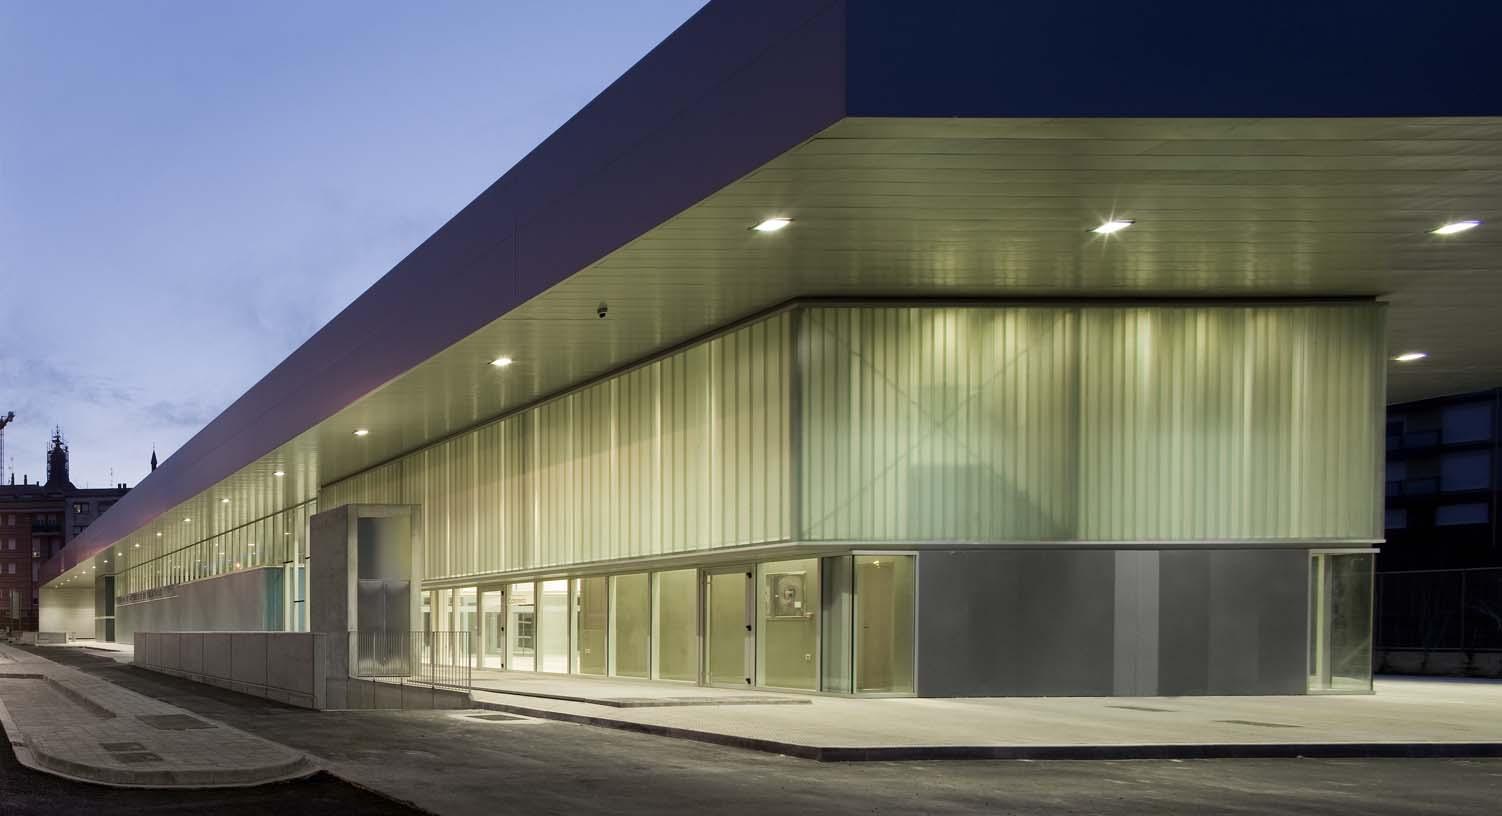 Calatayud_Bus_Station_07_Architecture_IDOM_photo_Aitor_Ortiz